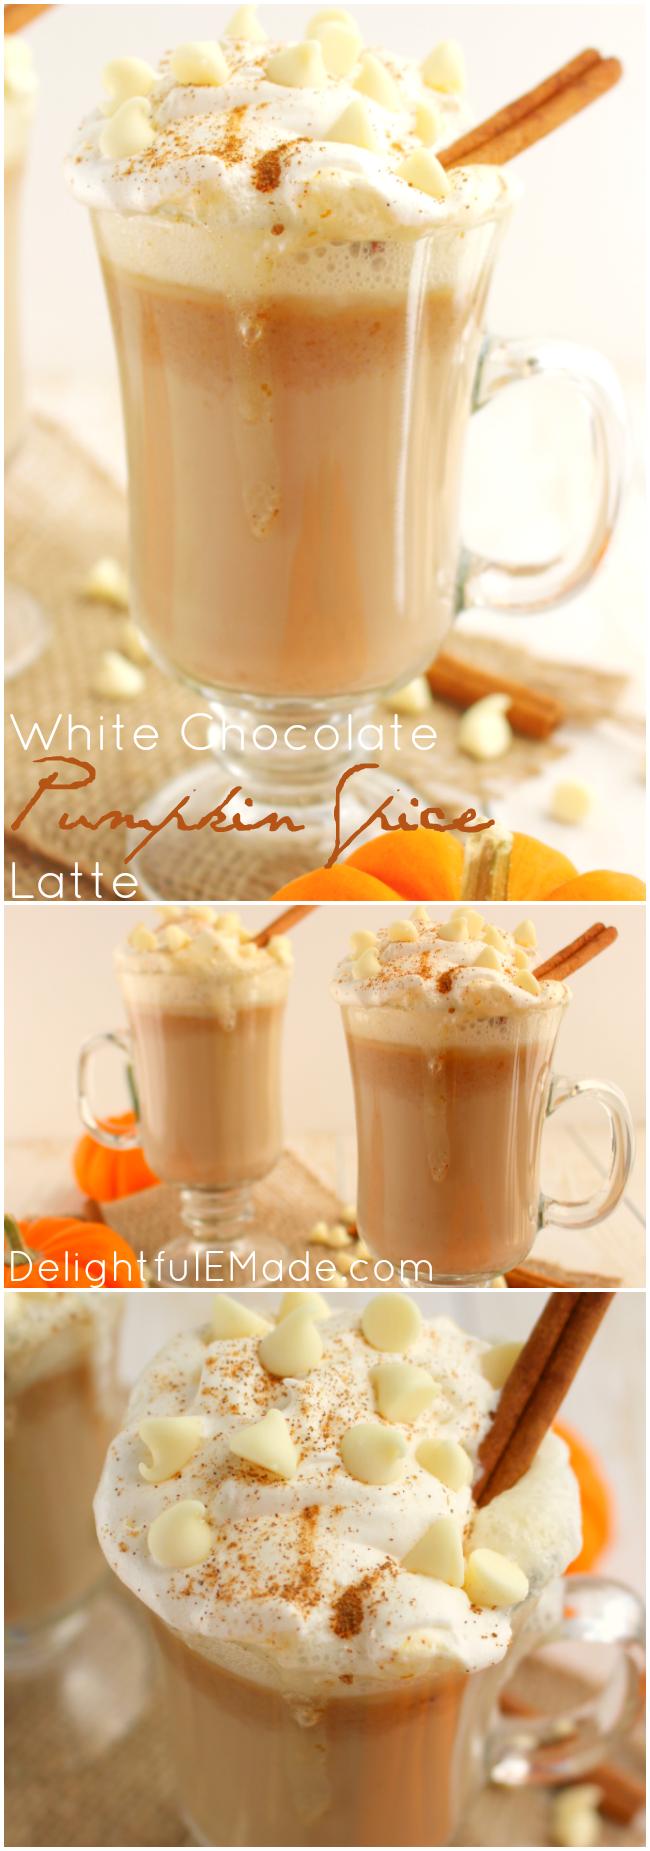 White Chocolate Pumpkin Spice LatteDelightful E Made